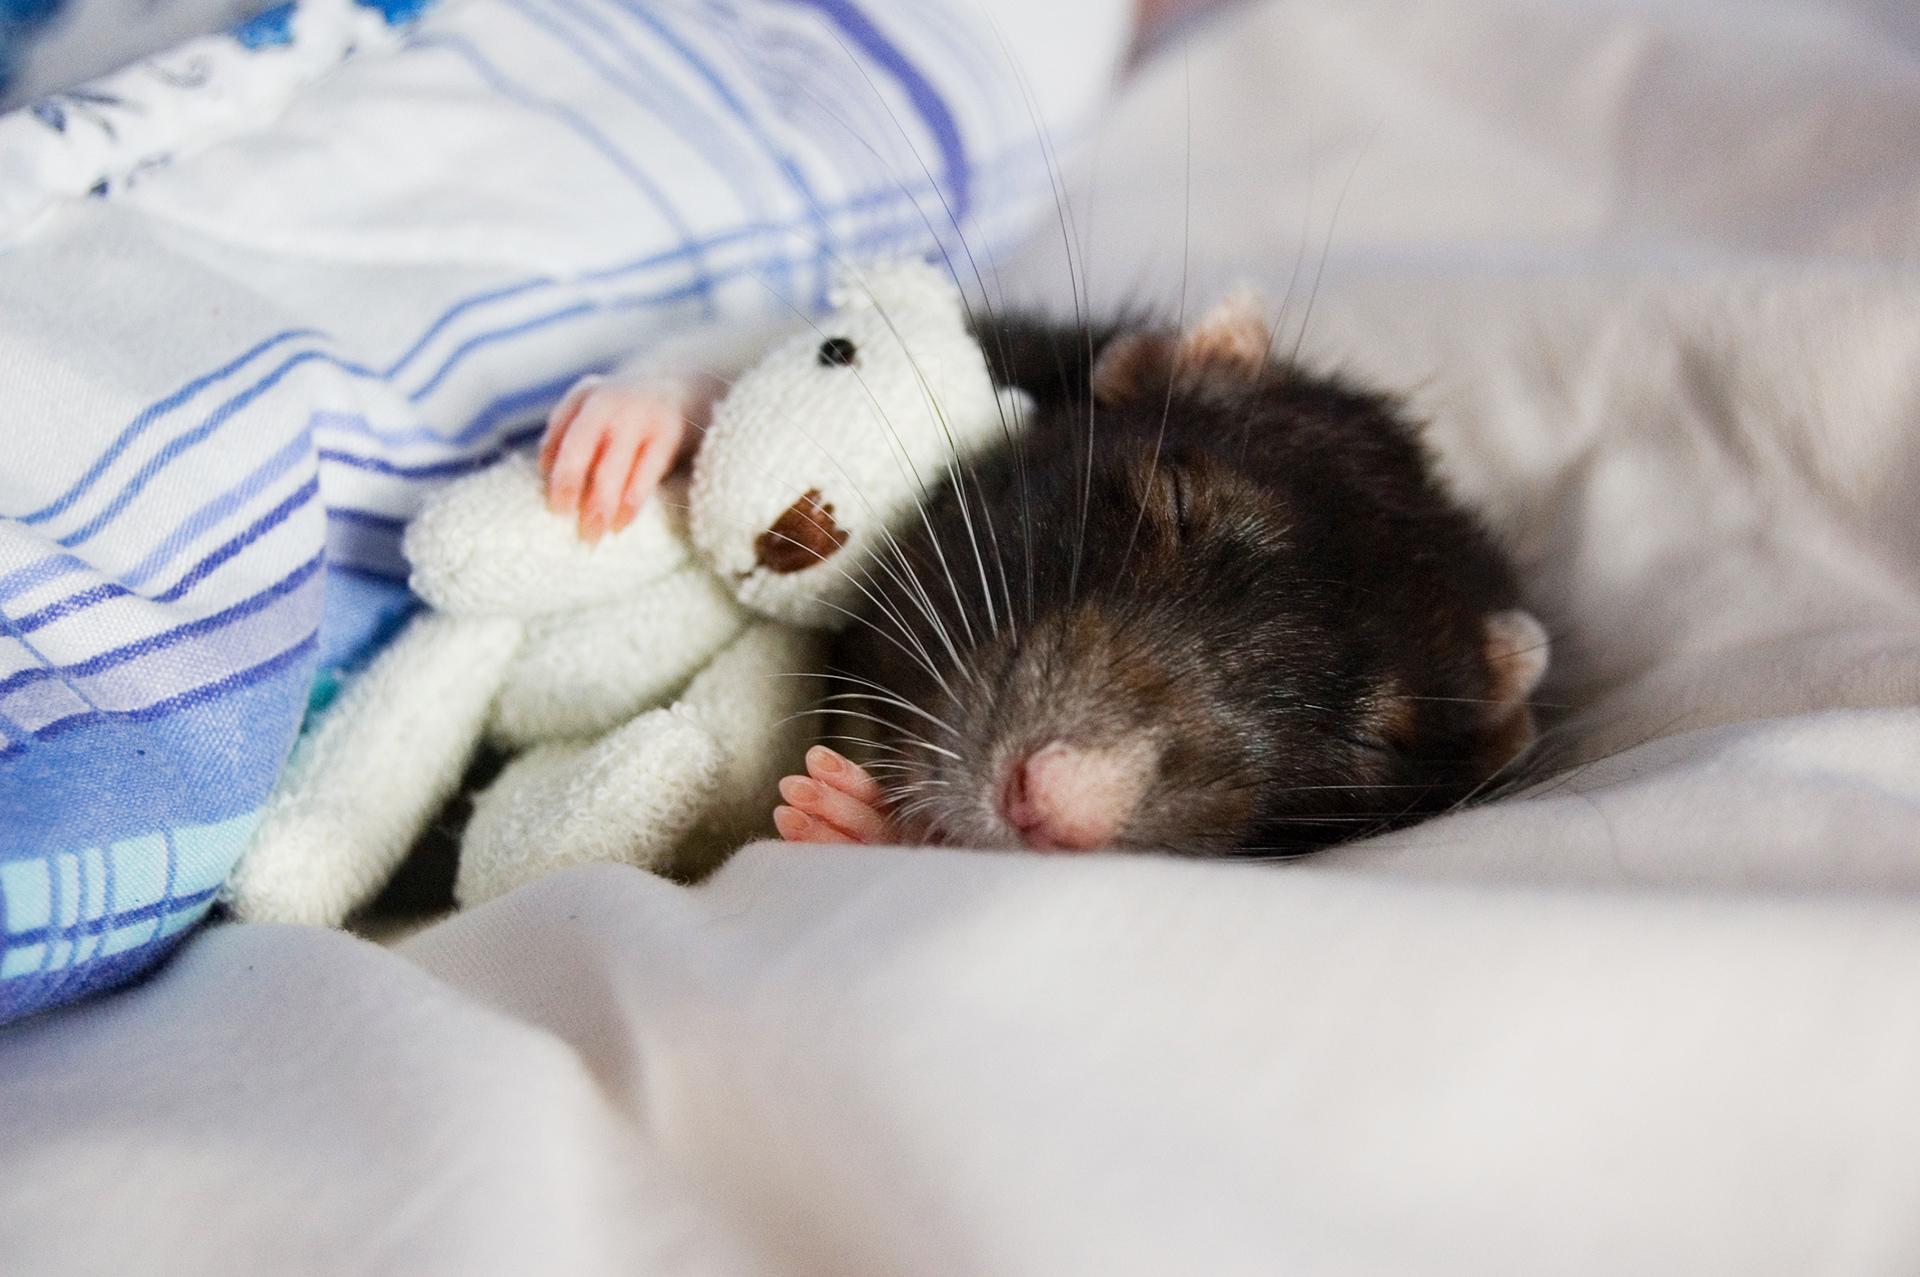 Photo of a sleeping rat with a teddy bear